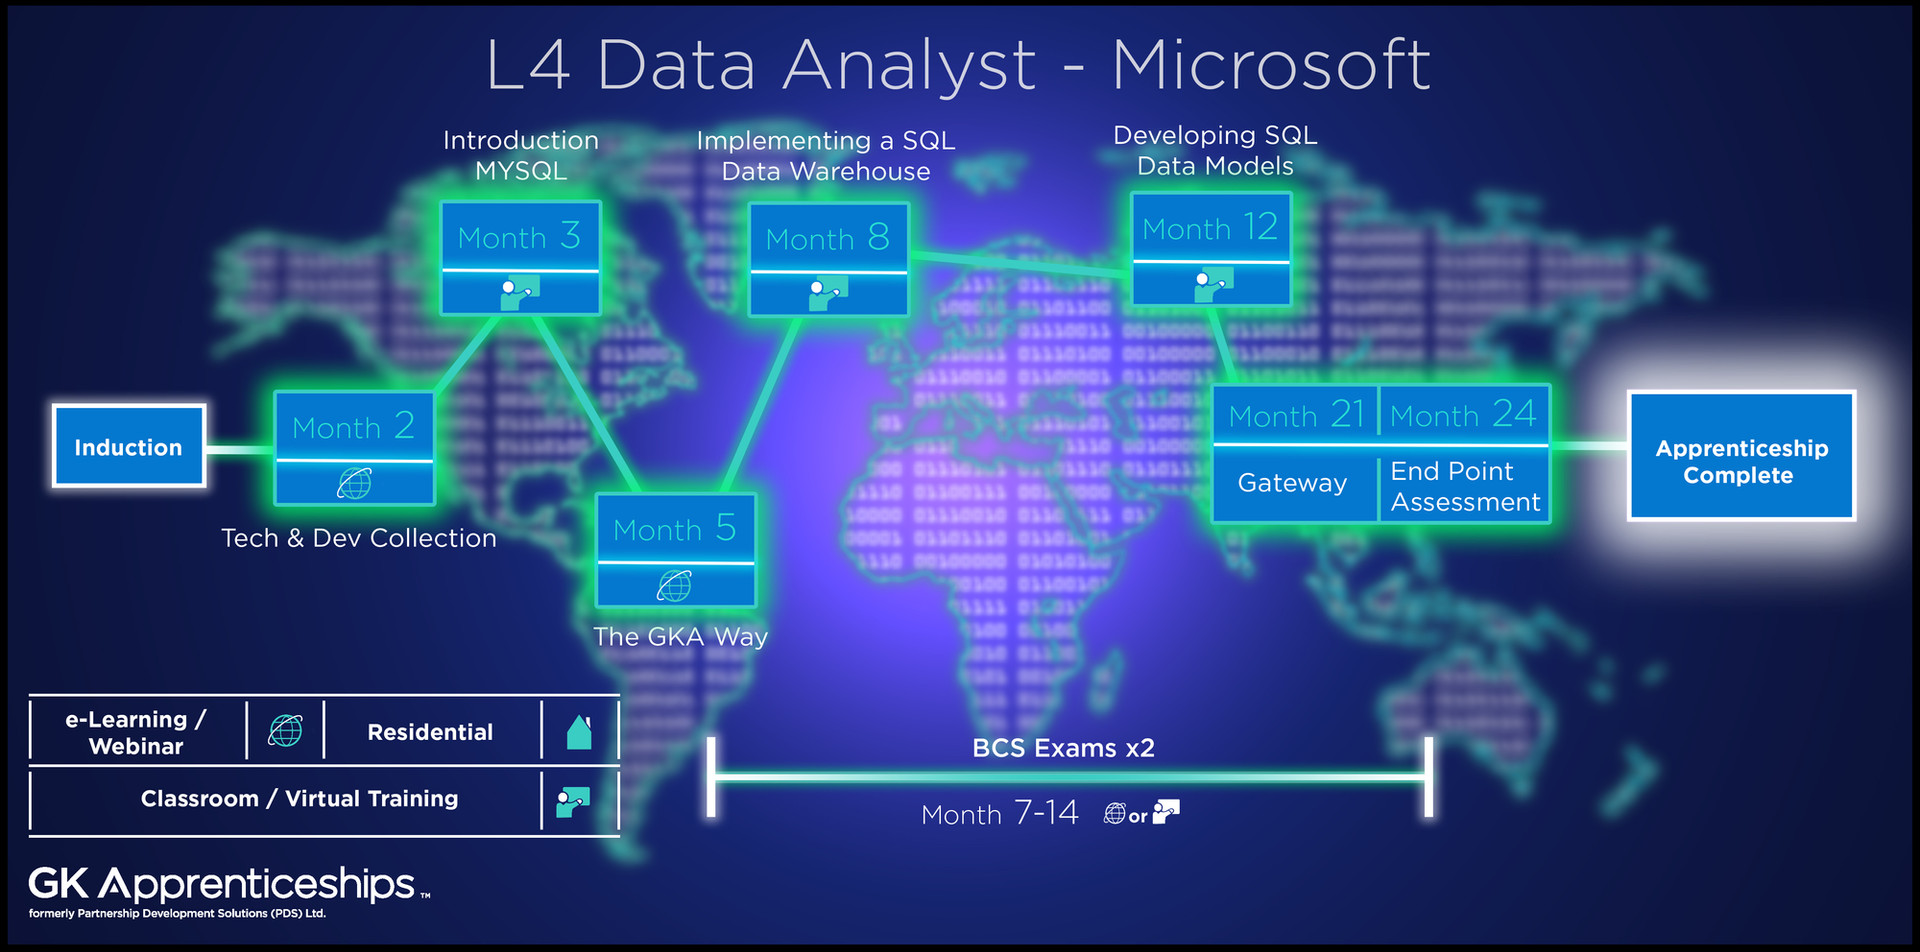 Data Science - Data Analyst - Microsoft